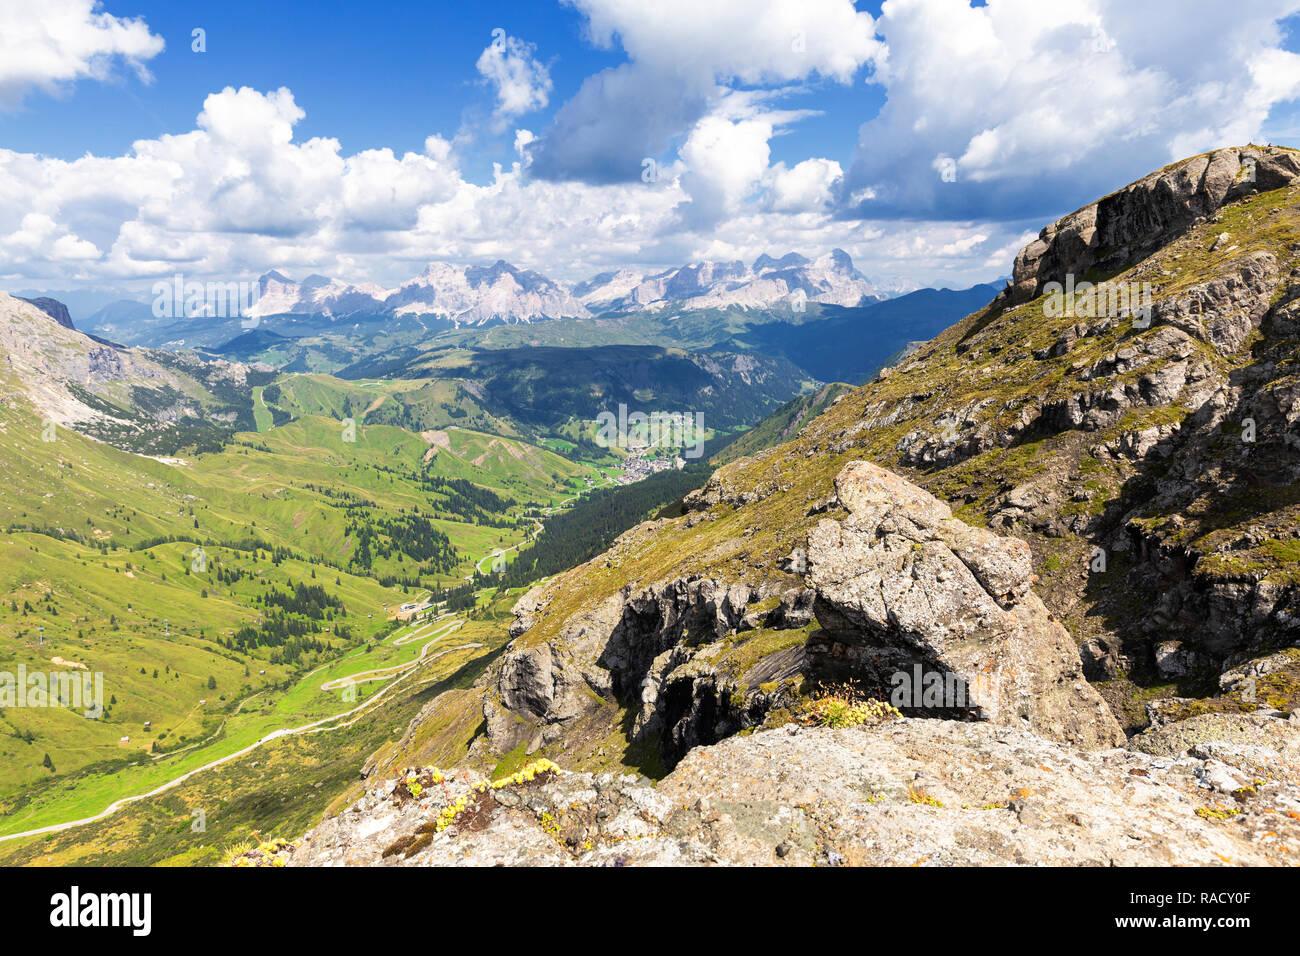 Badia Valley and Pordoi Pass road, Pordoi Pass, Fassa Valley, Trentino, Dolomites, Italy, Europe - Stock Image